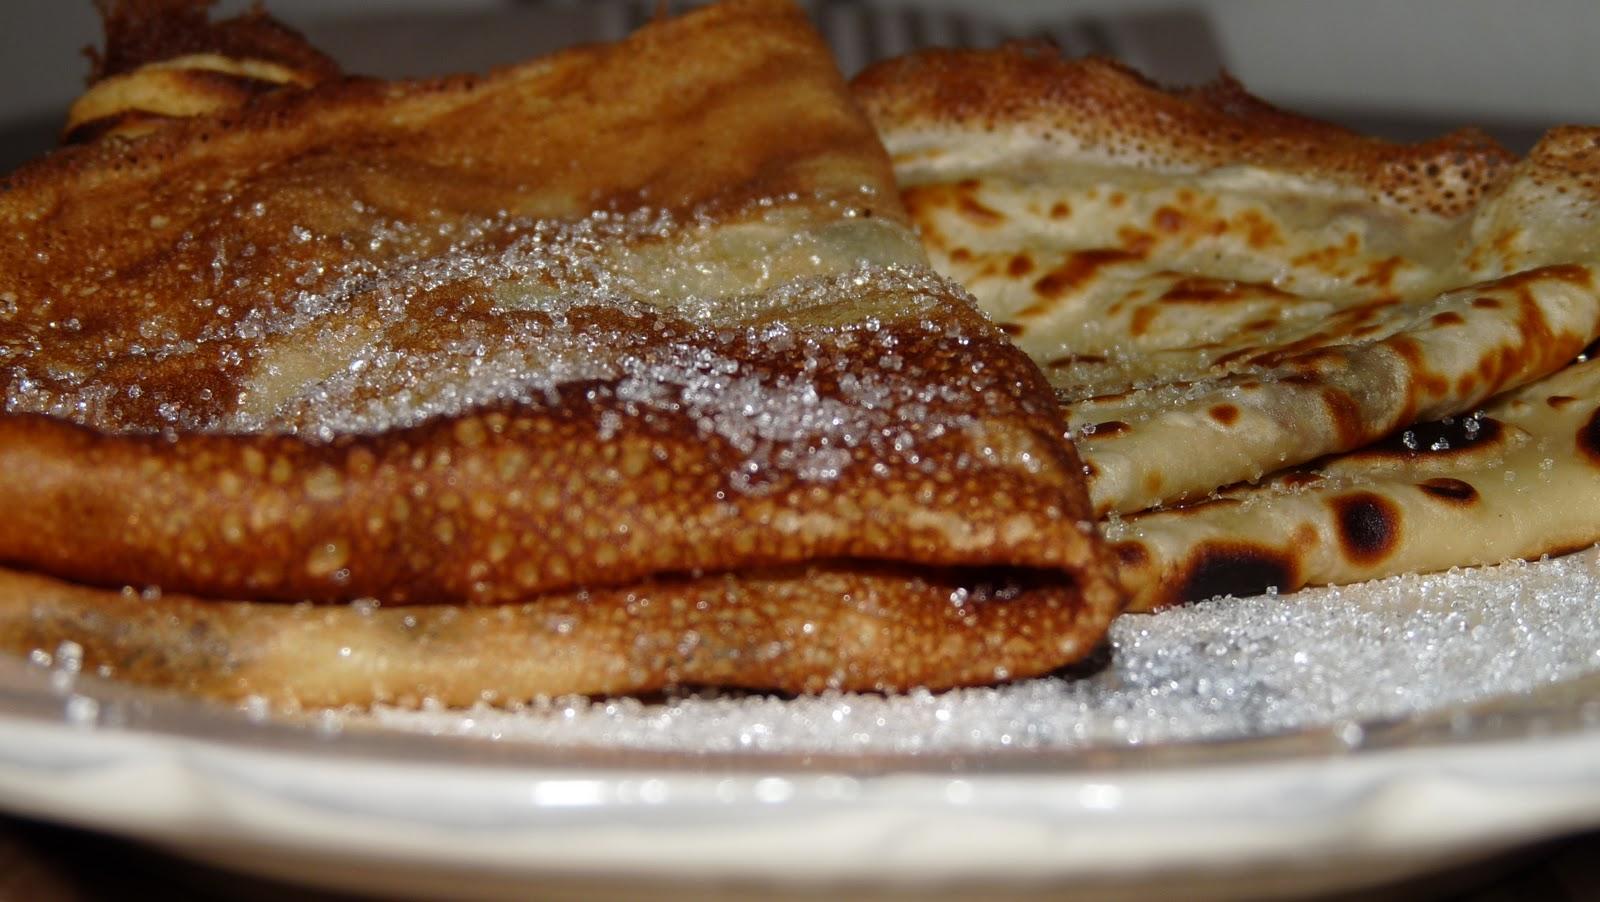 Recette p te cr pe la recette de ma tante bretonne c est ici - Recette pate a crepe bretonne ...